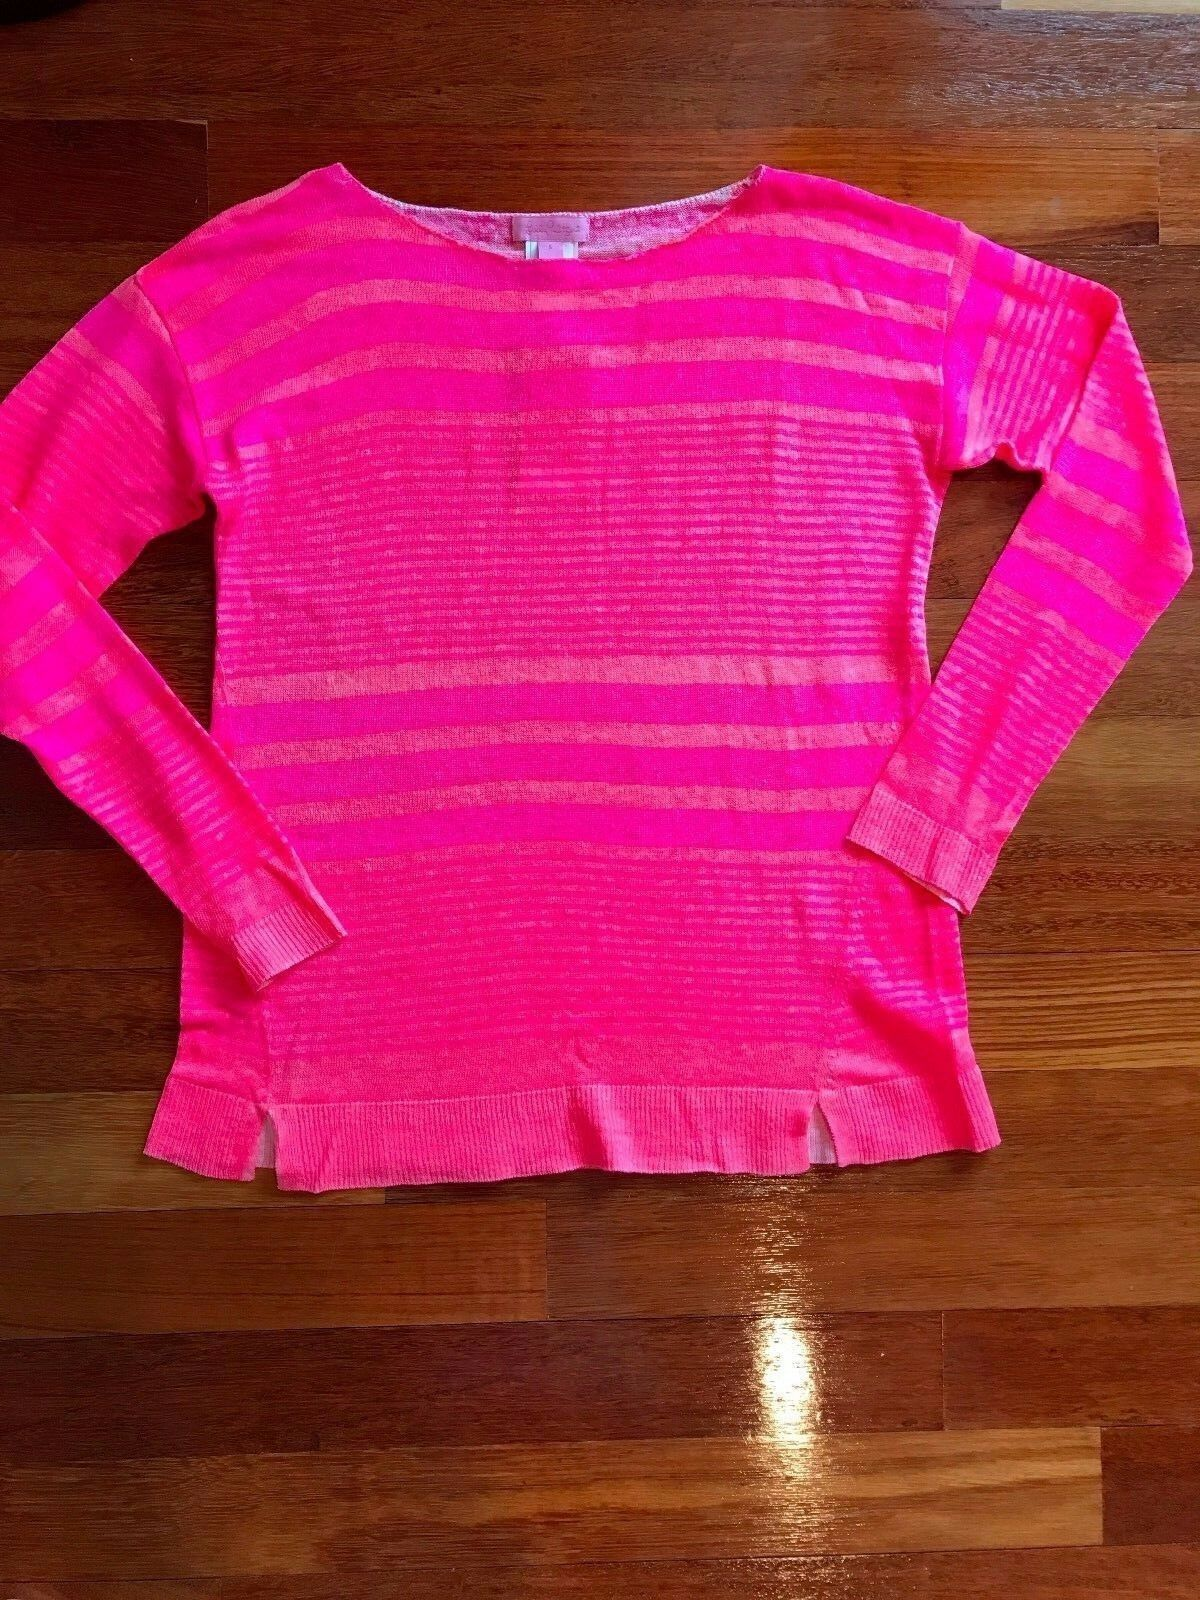 NWT Lilly Pulitzer Camilla Sweater Kir Royal Pi Exotic Garden Stripe Size L